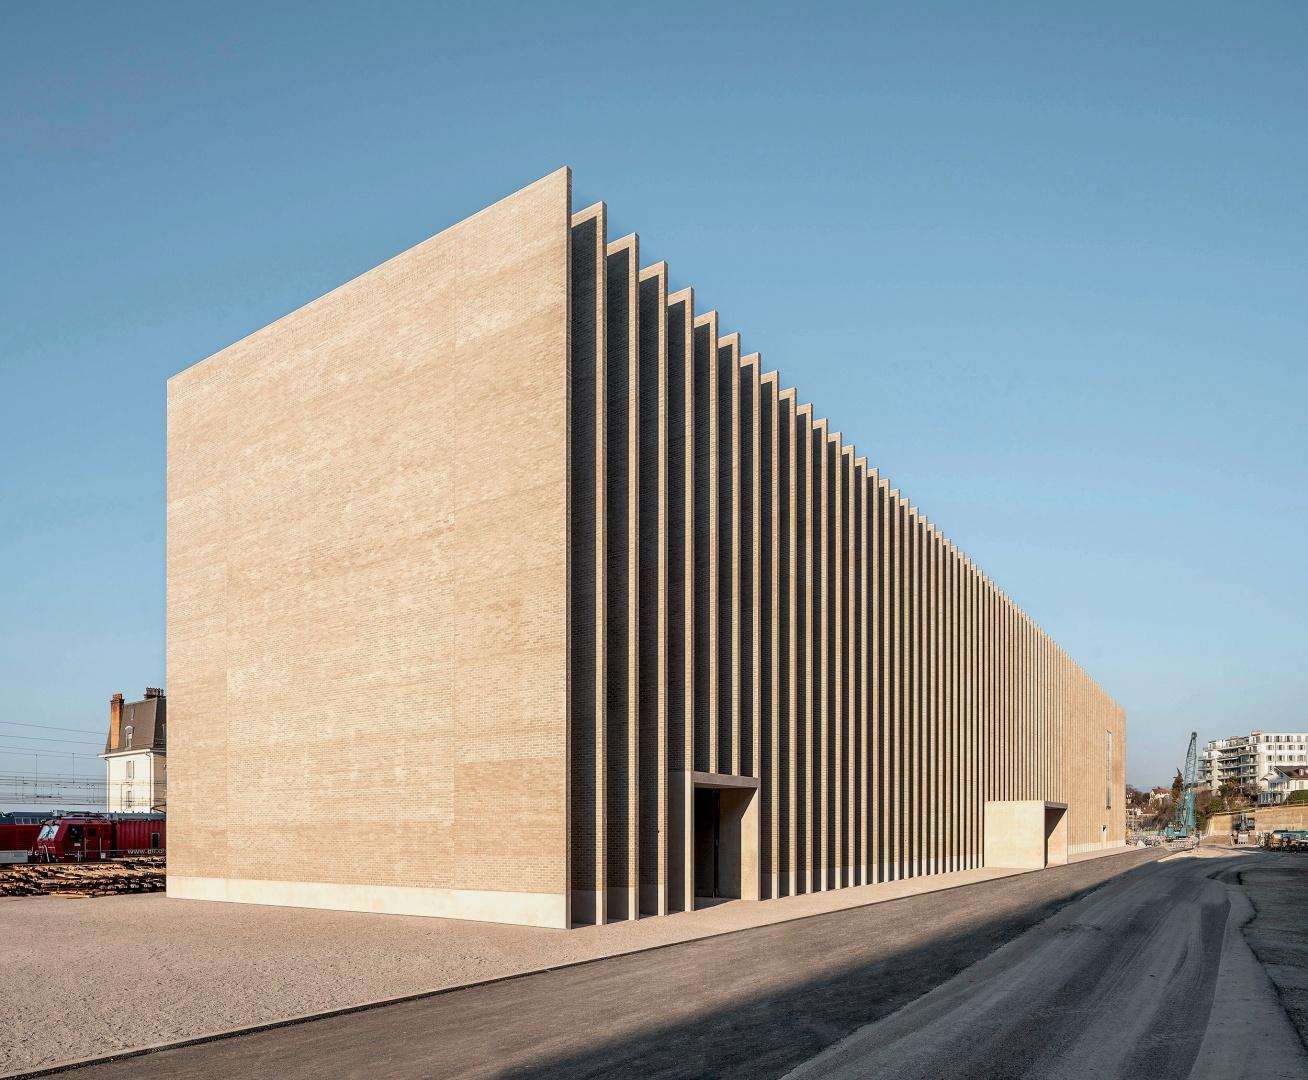 Das neue Kantonale Kunstmuseum (MCBA) in Lausanne. © Matthieu Gafsou